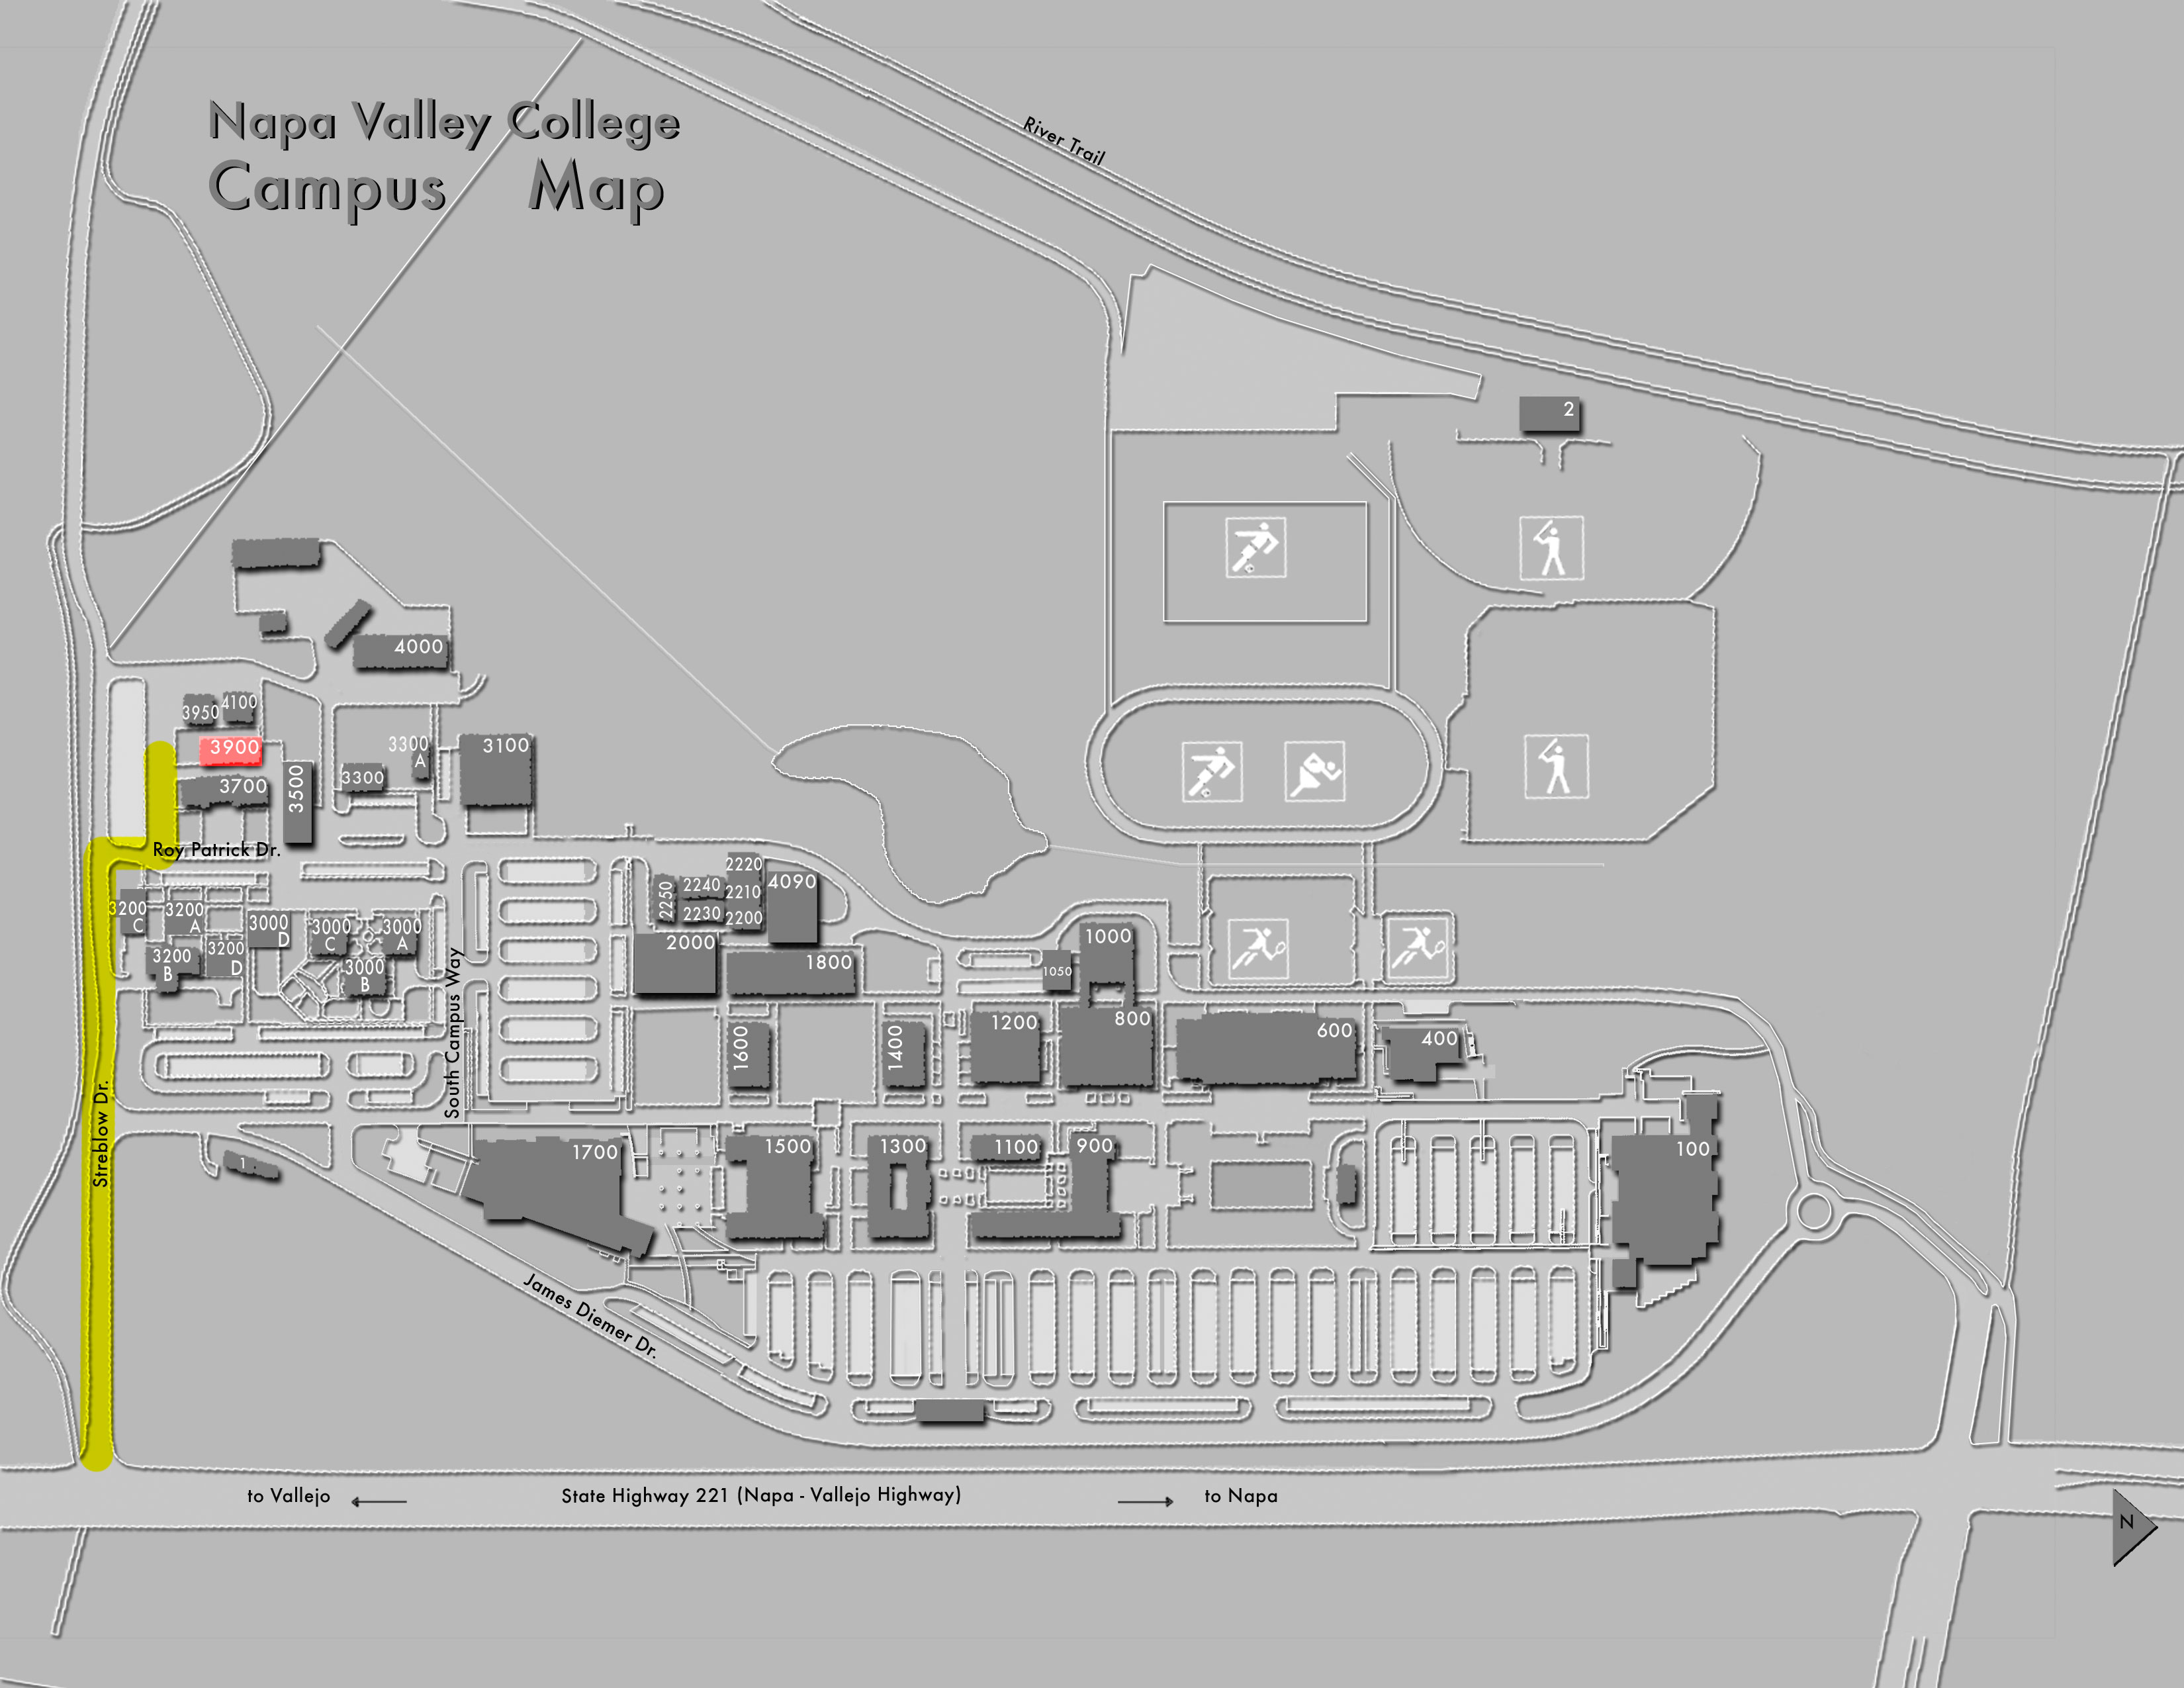 napa valley college campus map Digital Design Graphics Technology Ddgt napa valley college campus map